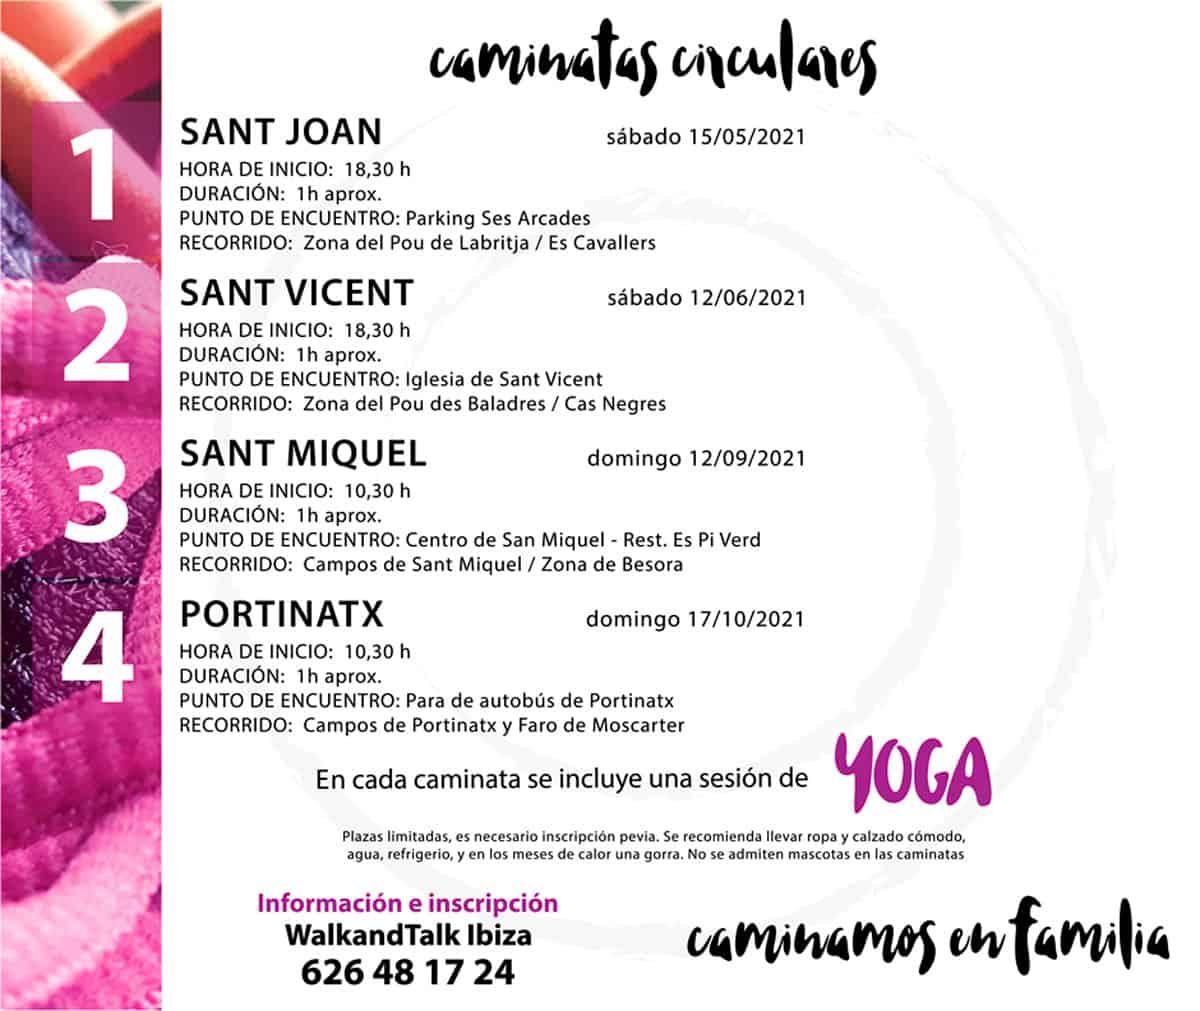 sant-joan-camina-rutas-senderismo-familia-walk-and-talk-ibiza-2021-welcometoibiza